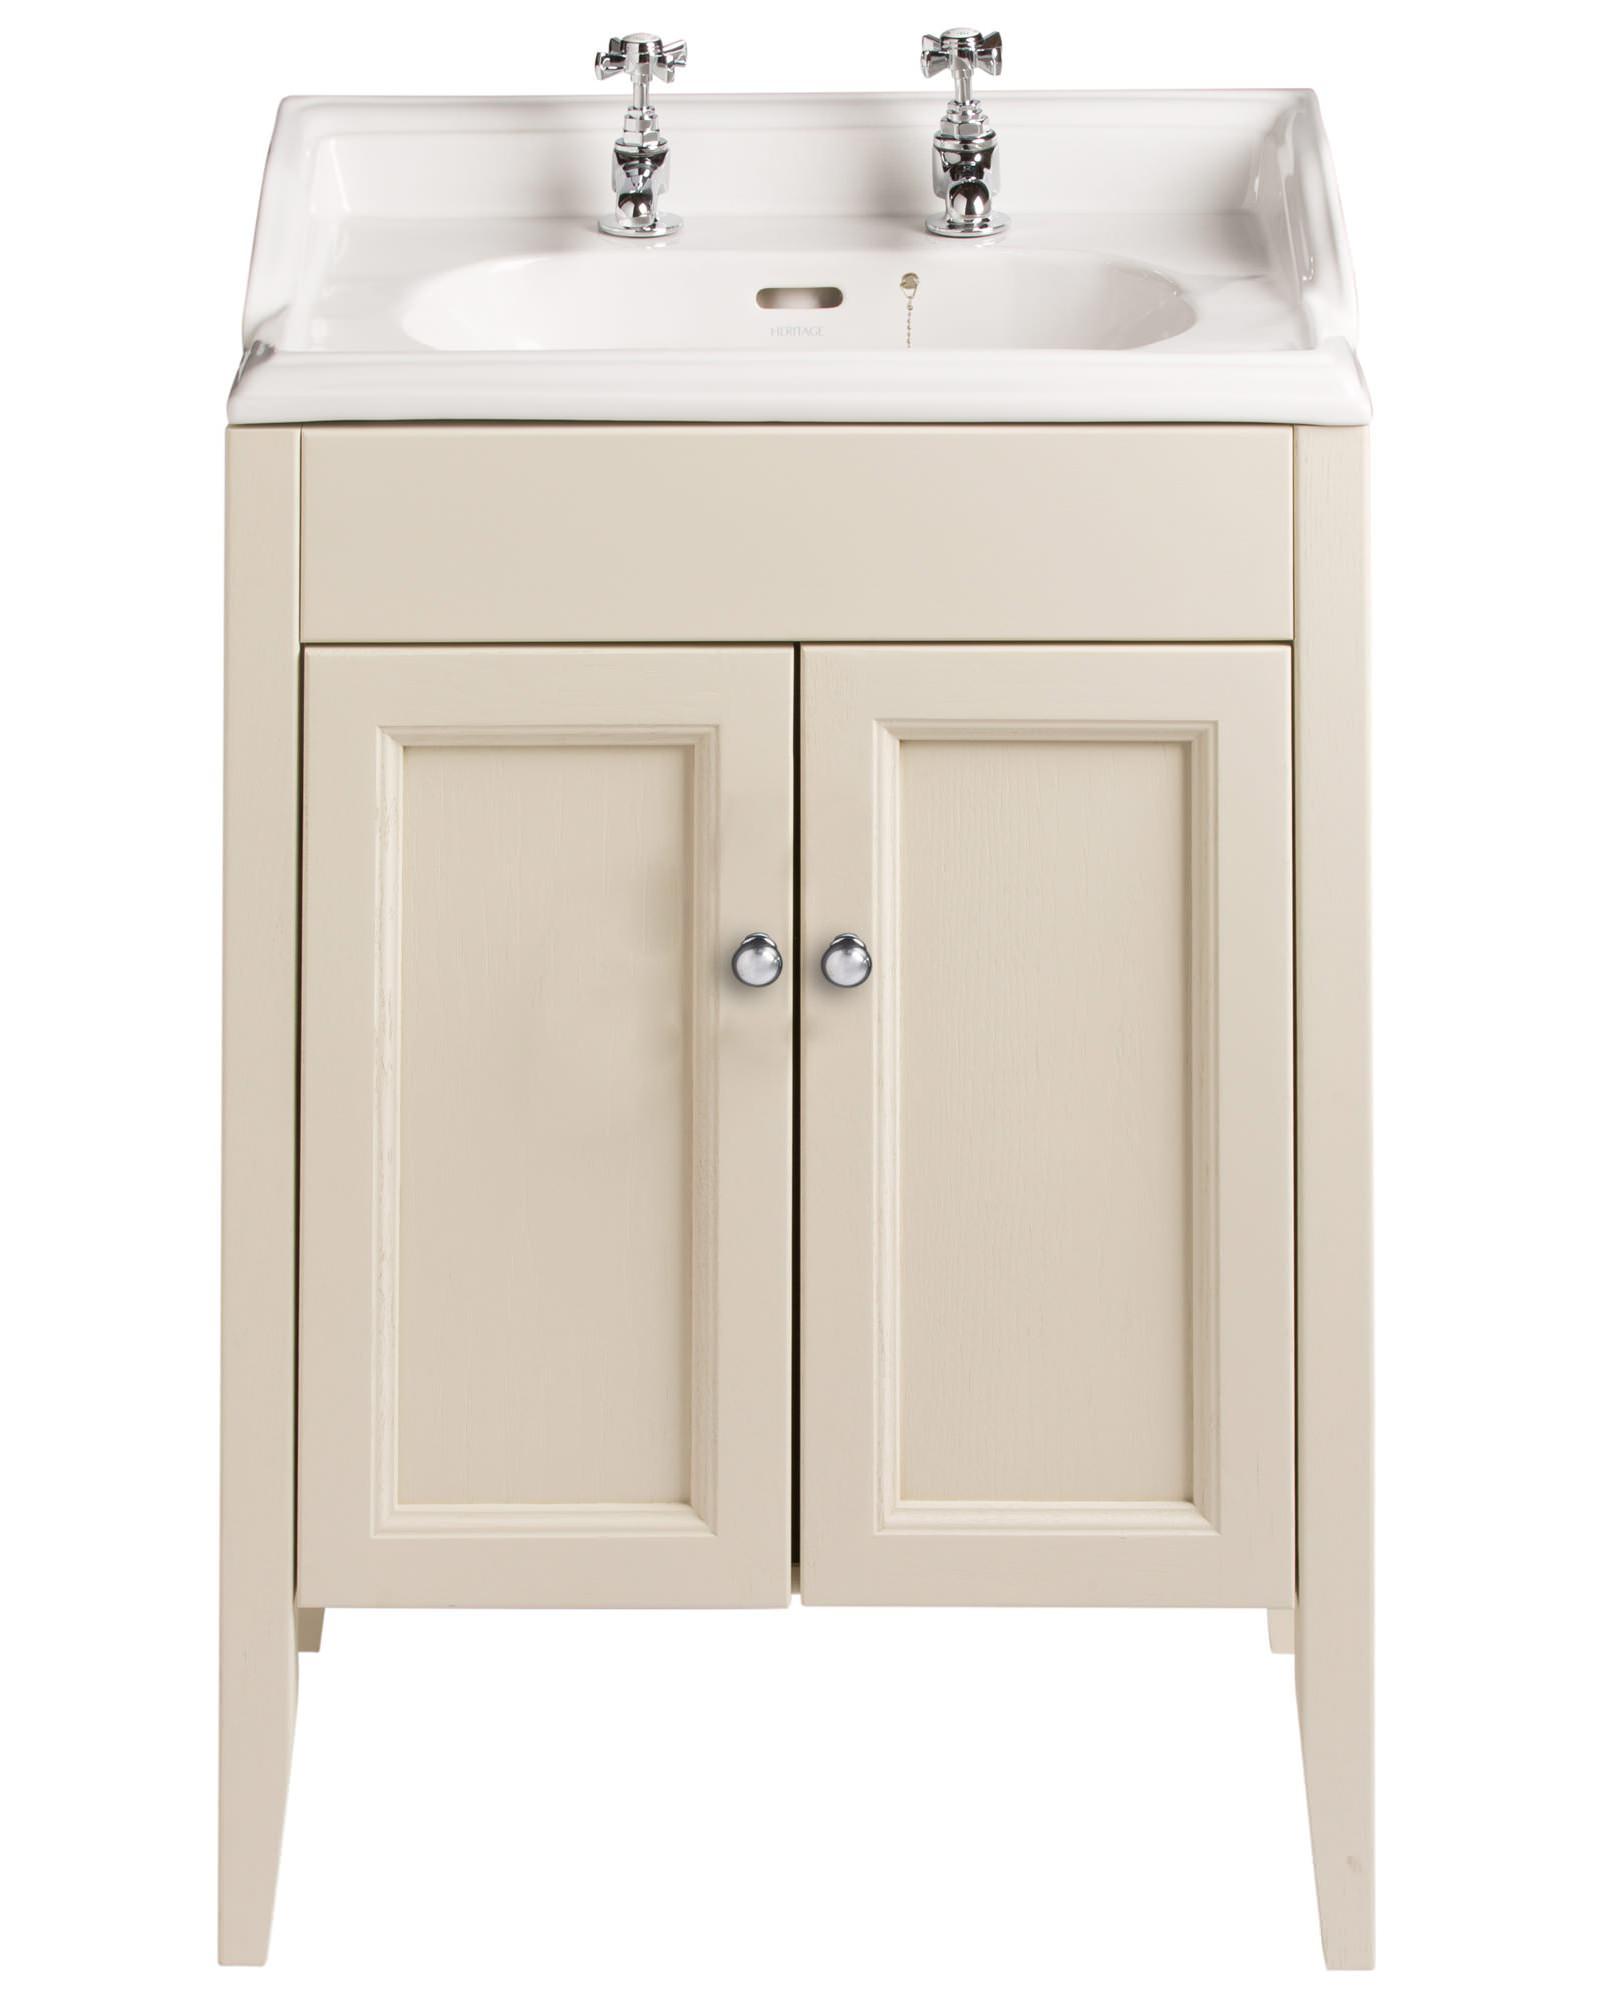 Heritage Bathroom Vanity: Heritage Caversham Oyster Vanity Unit For Dorchester